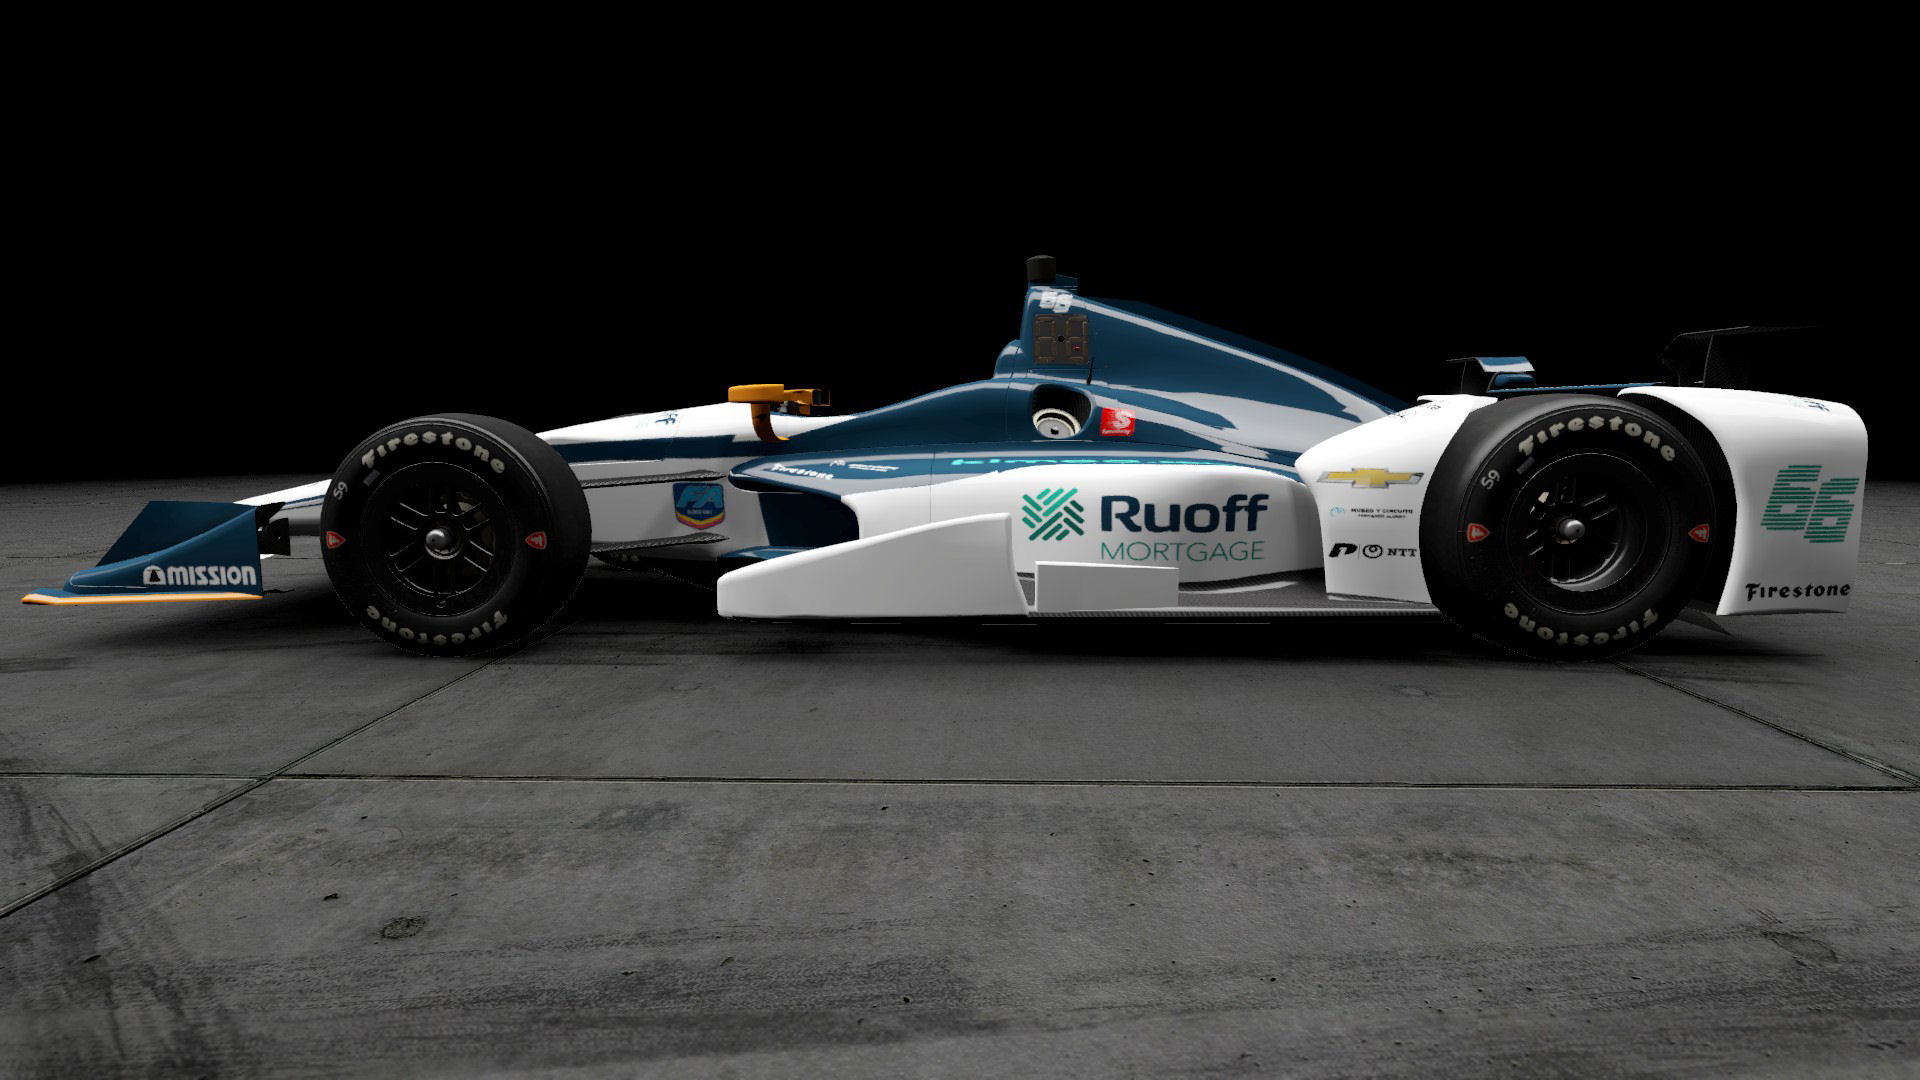 Fernando Alonso 2020 Indy 500 Mclaren dallara dw12 chevy oval 03.jpg